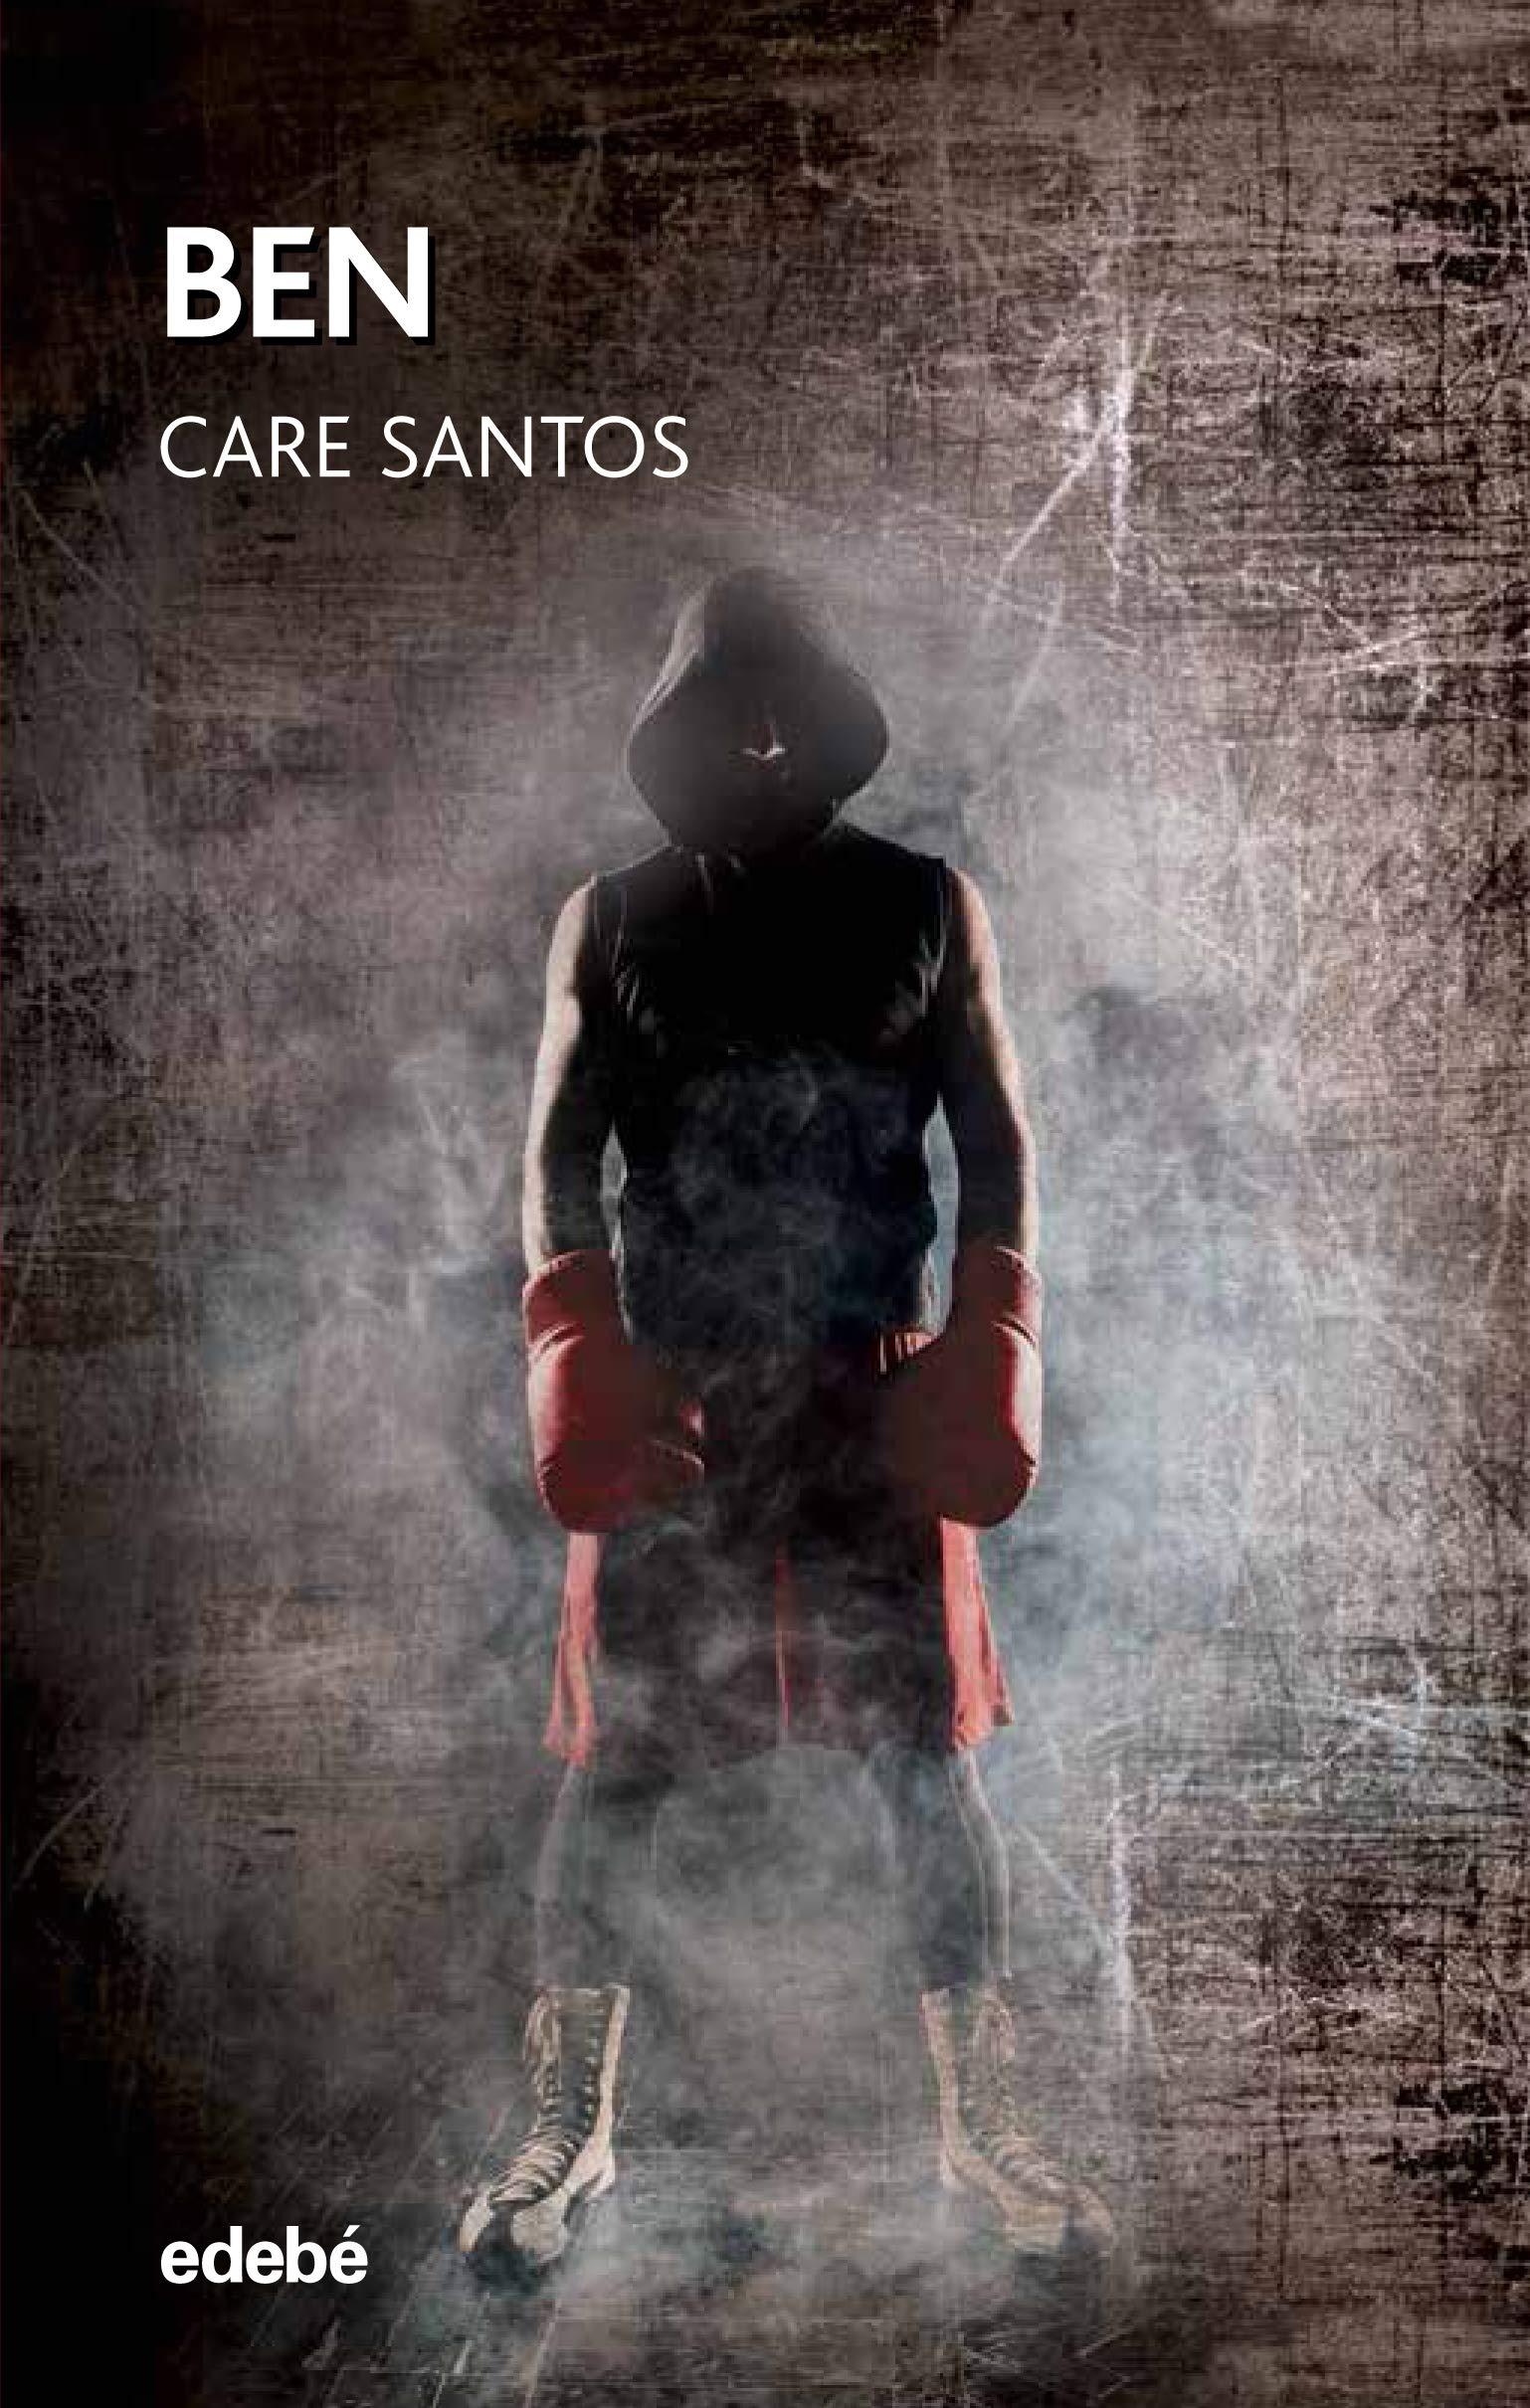 Ben, de Care Santos - Selección de libros infantiles y juveniles